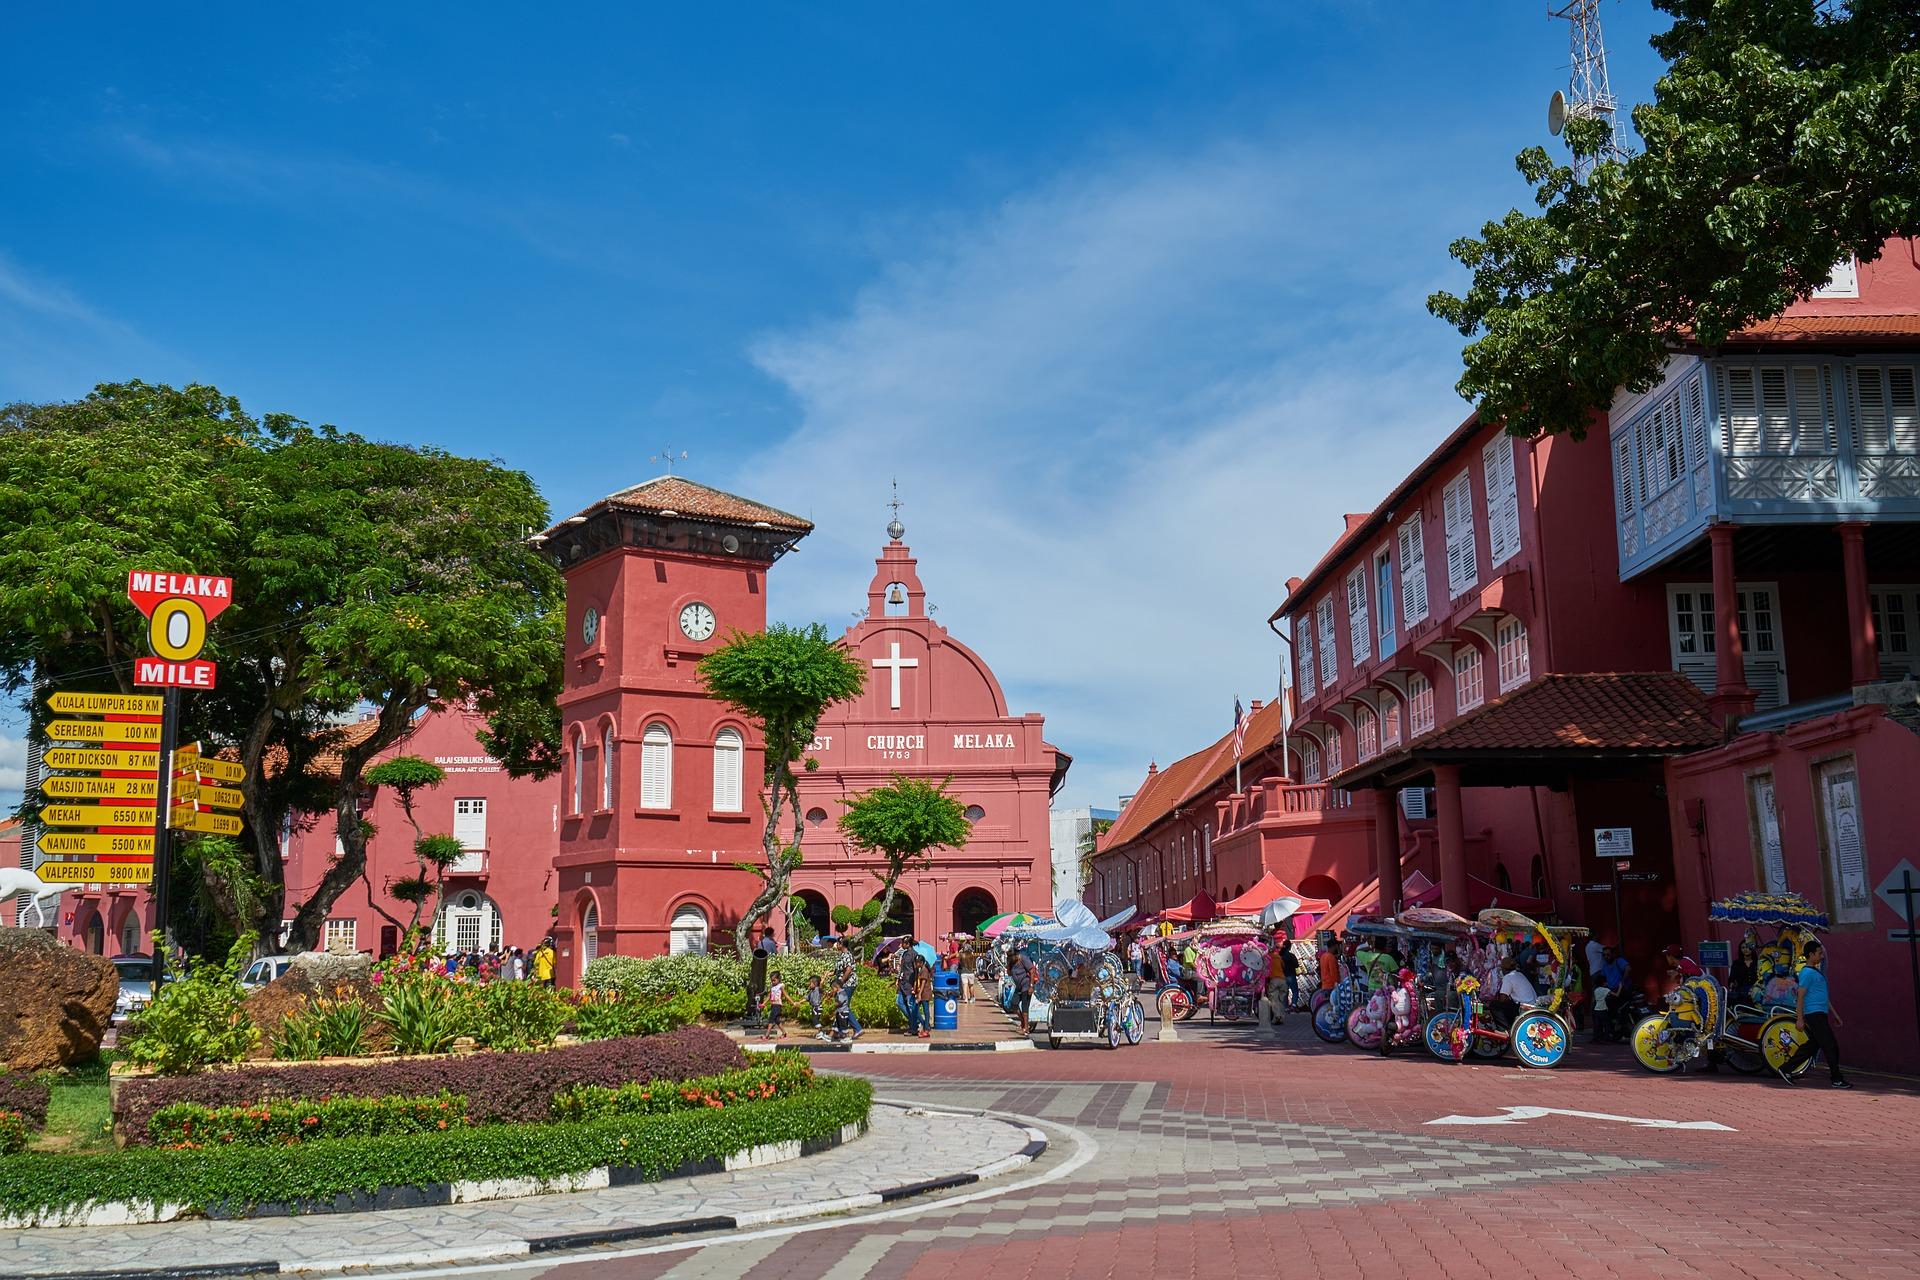 Biserica Melaka din Malaezia